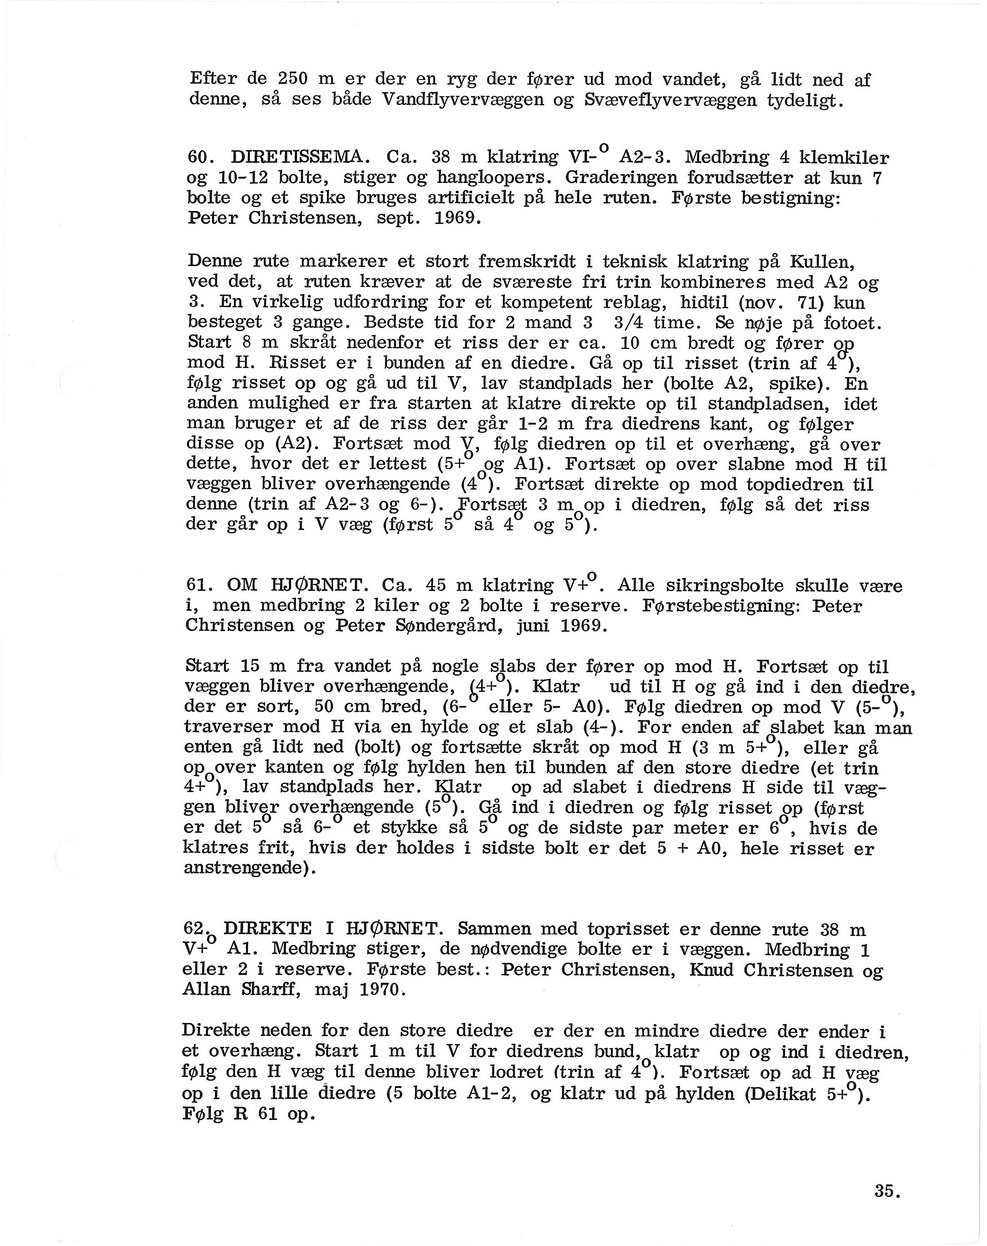 Kullen guide 1972 035.jpg